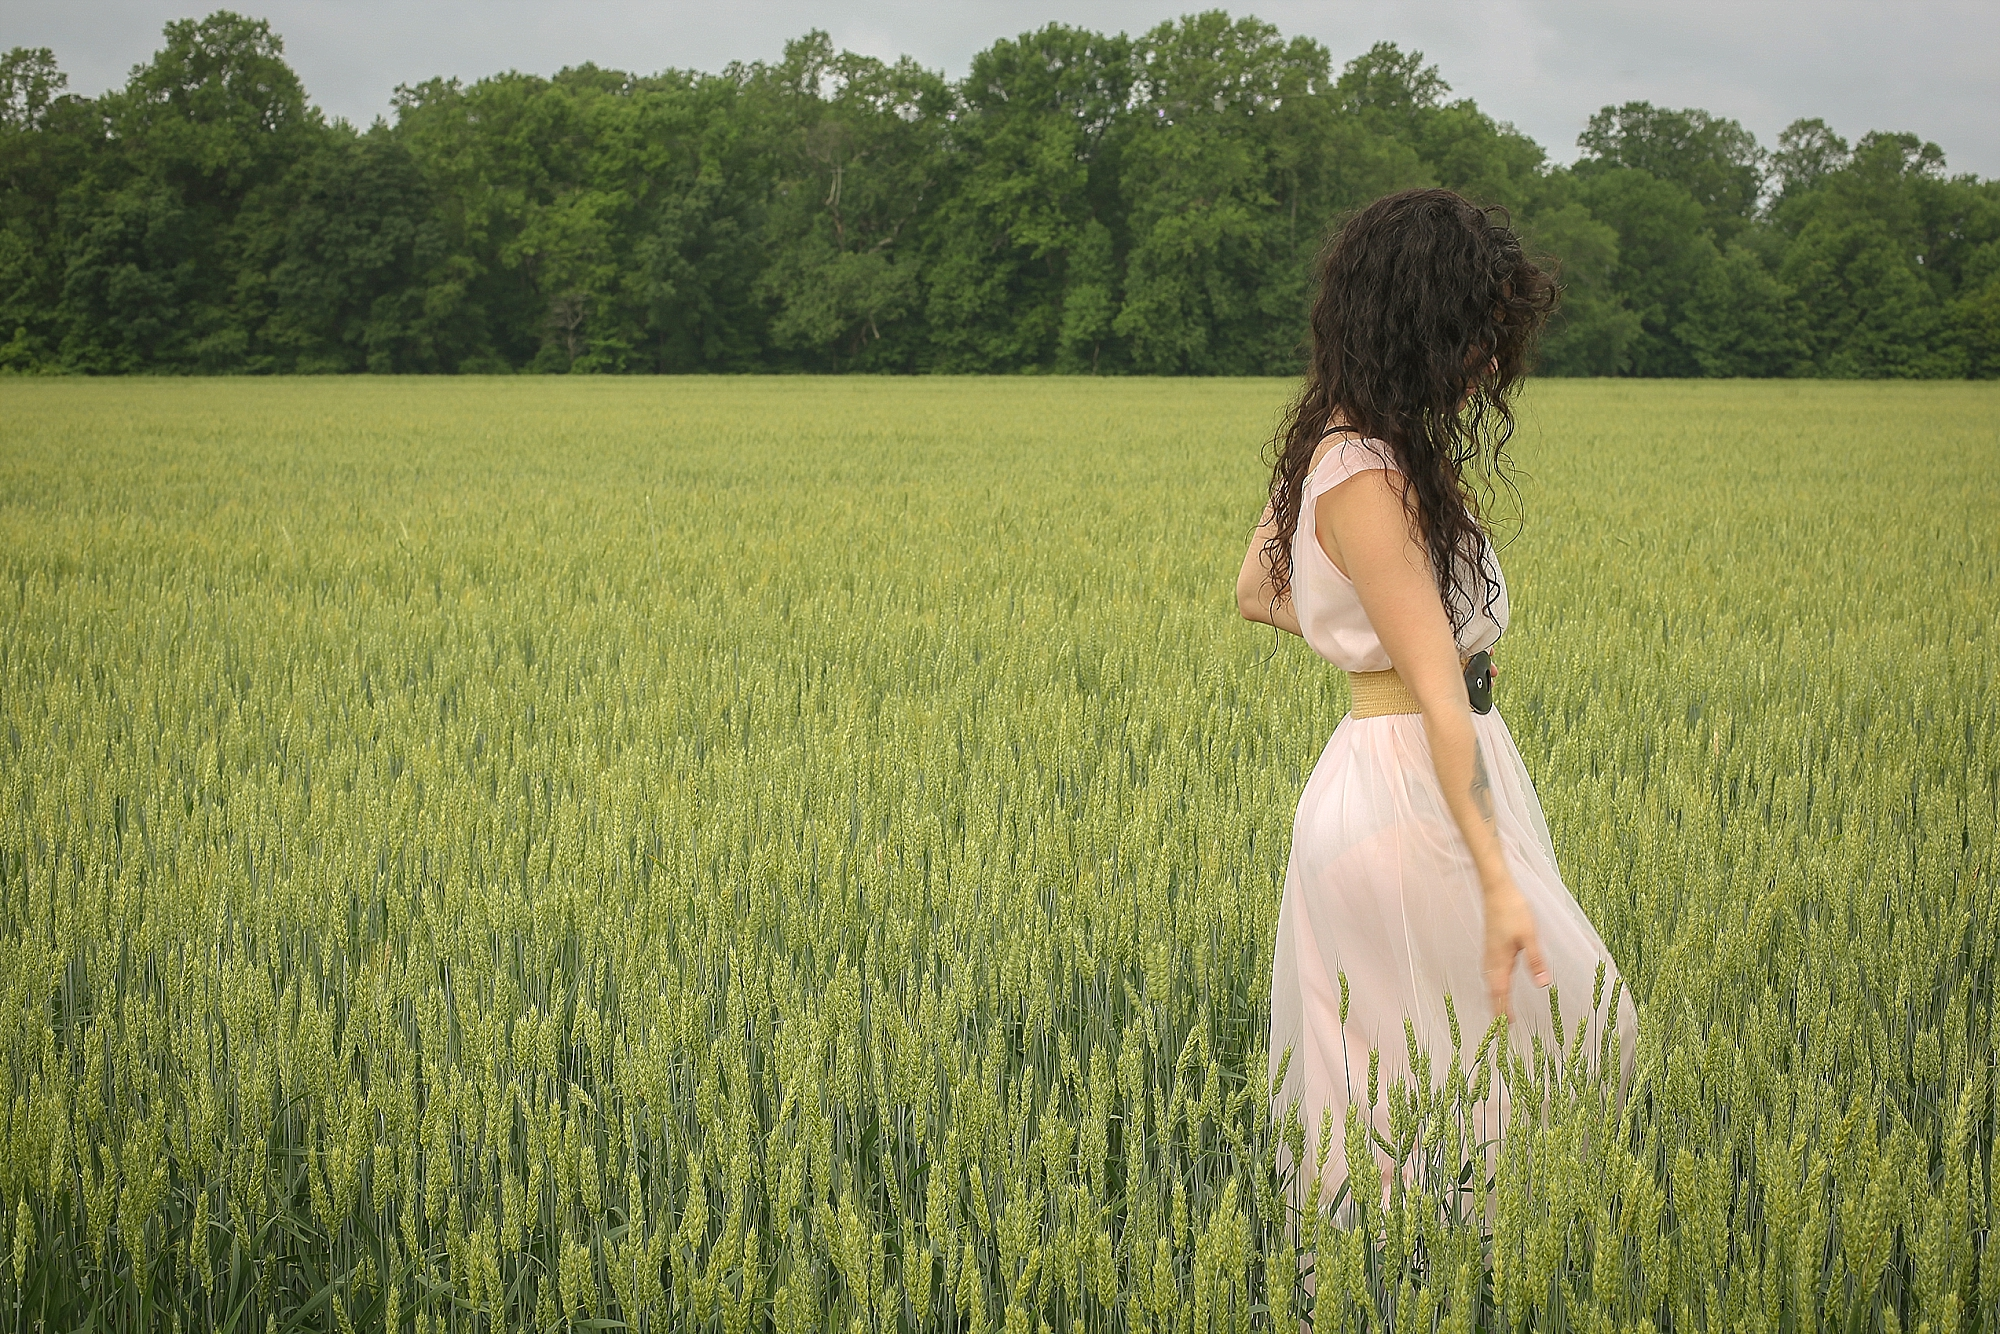 Chesapeak-Reedville-Virginia-Creative-Portrait-Photography_0010.jpg